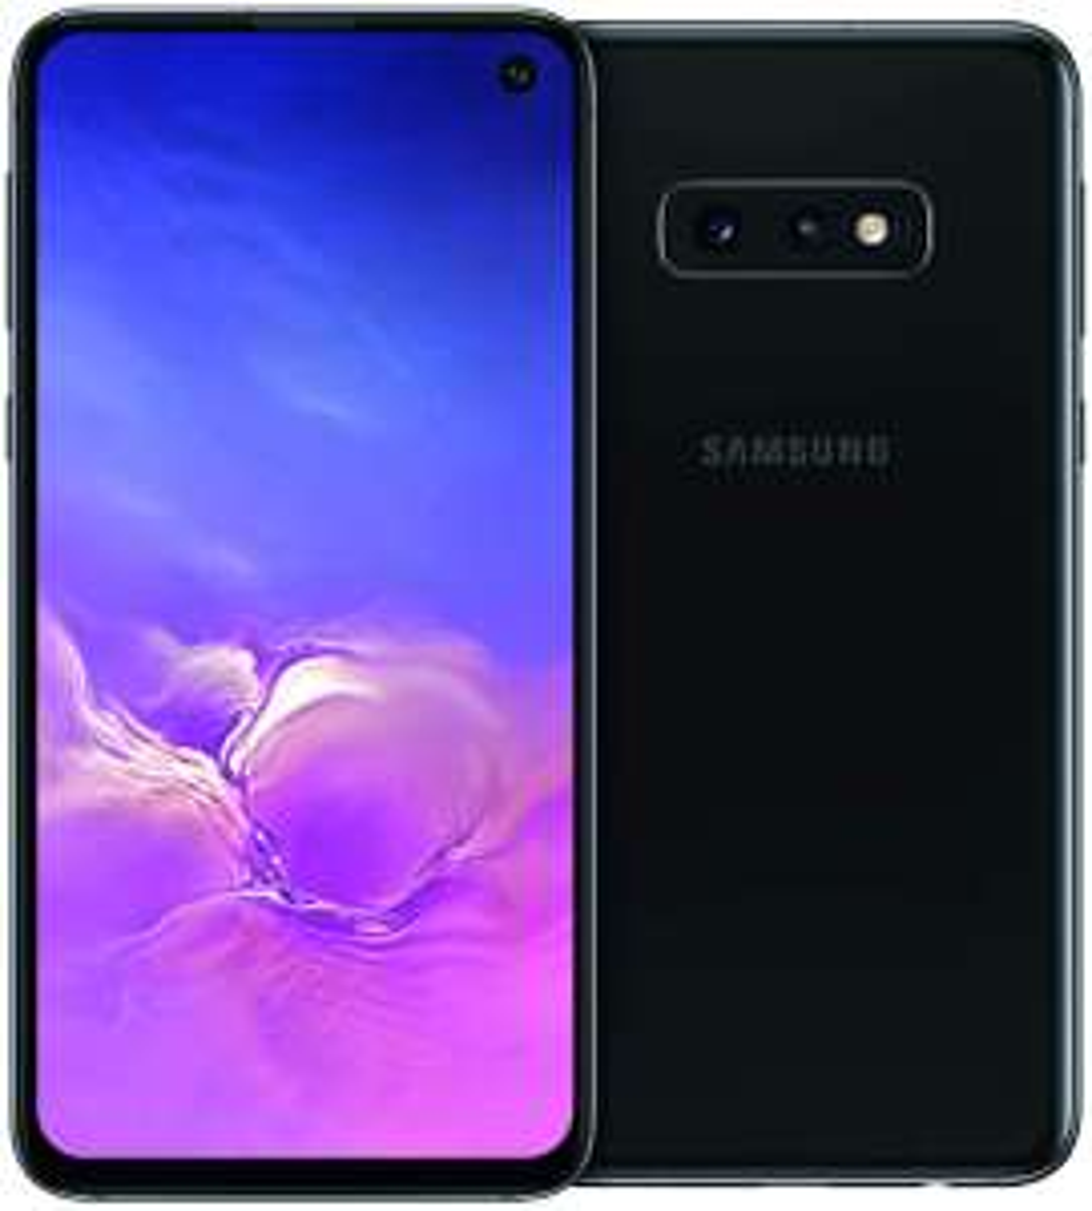 Samsung Galaxy S10e 128 GB Hybrid-SIM Android Smartphone - Black (UK Version) £450.54 PRIME @ AMAZON UK